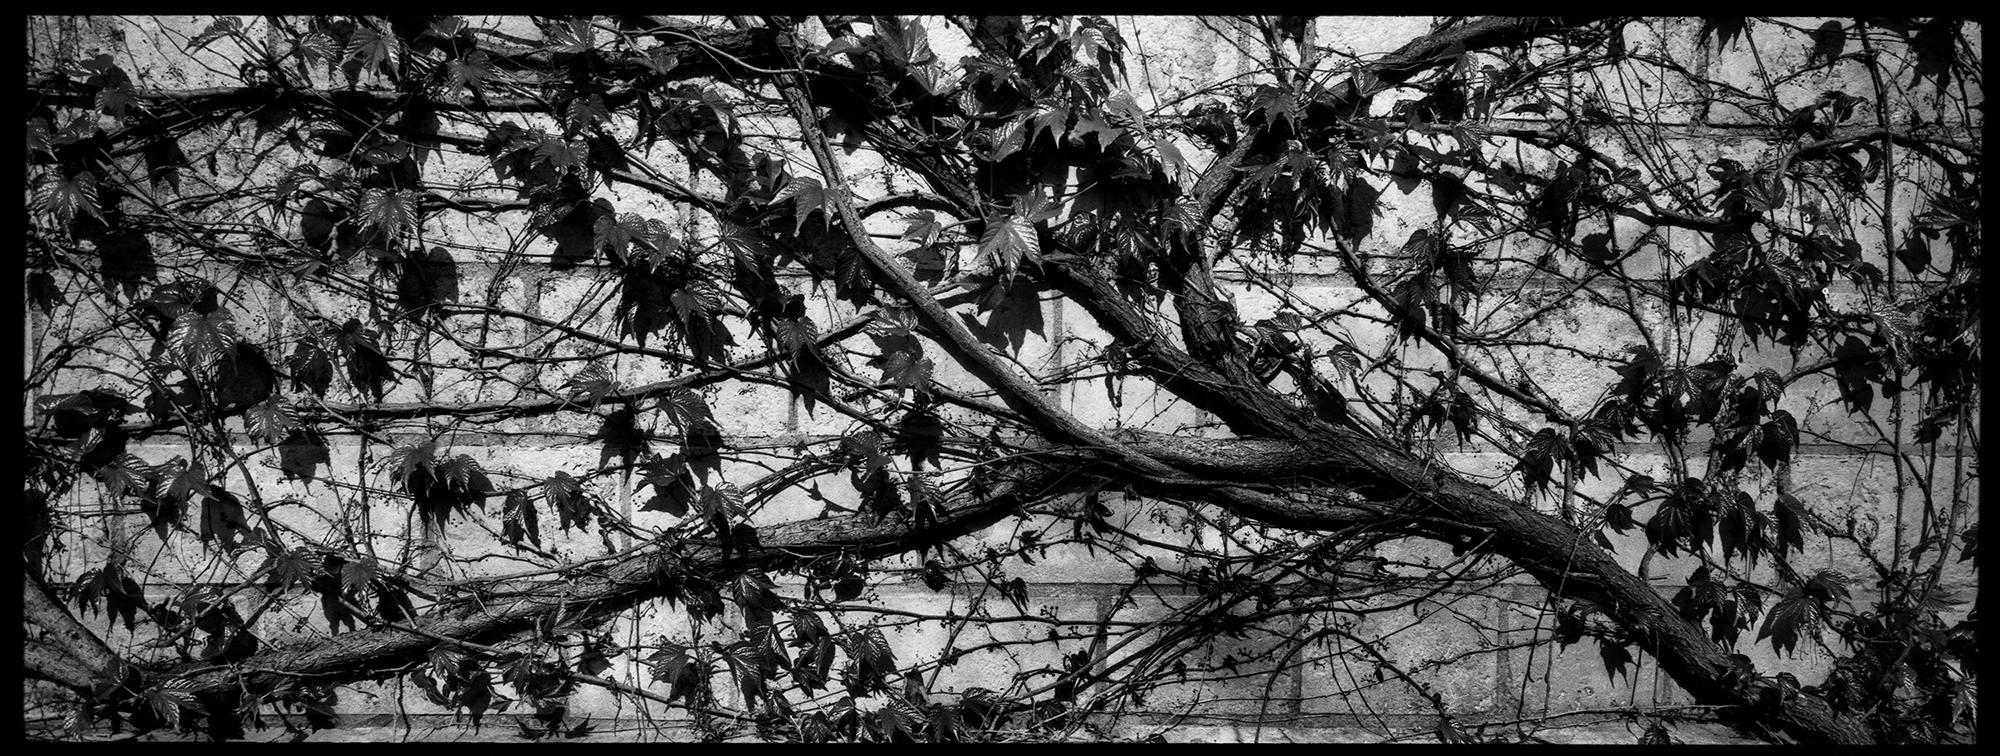 Trees, Plants, Flowers...